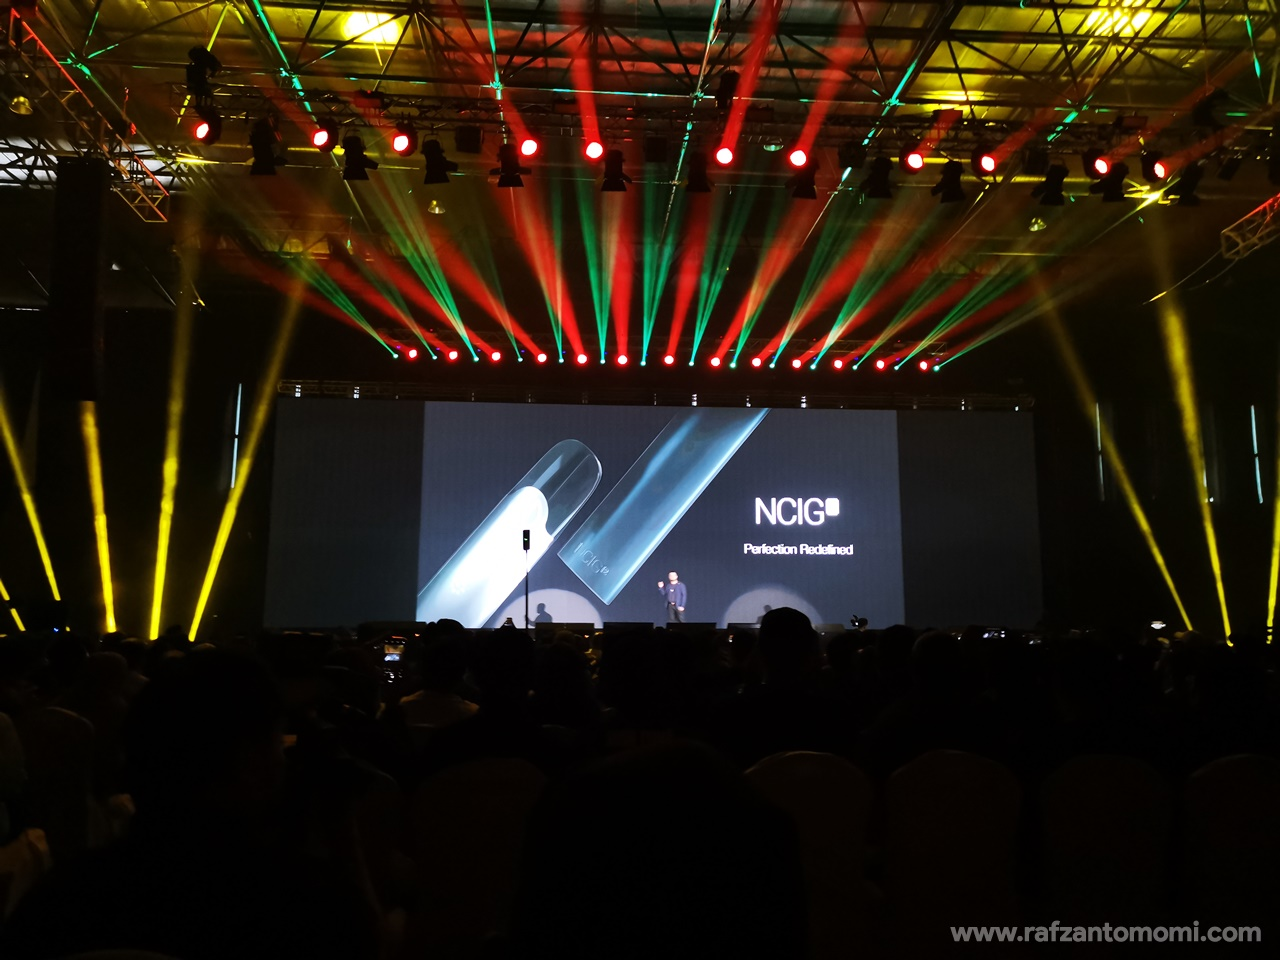 NCIG Bakal Berhentikan Operasinya Di Malaysia?